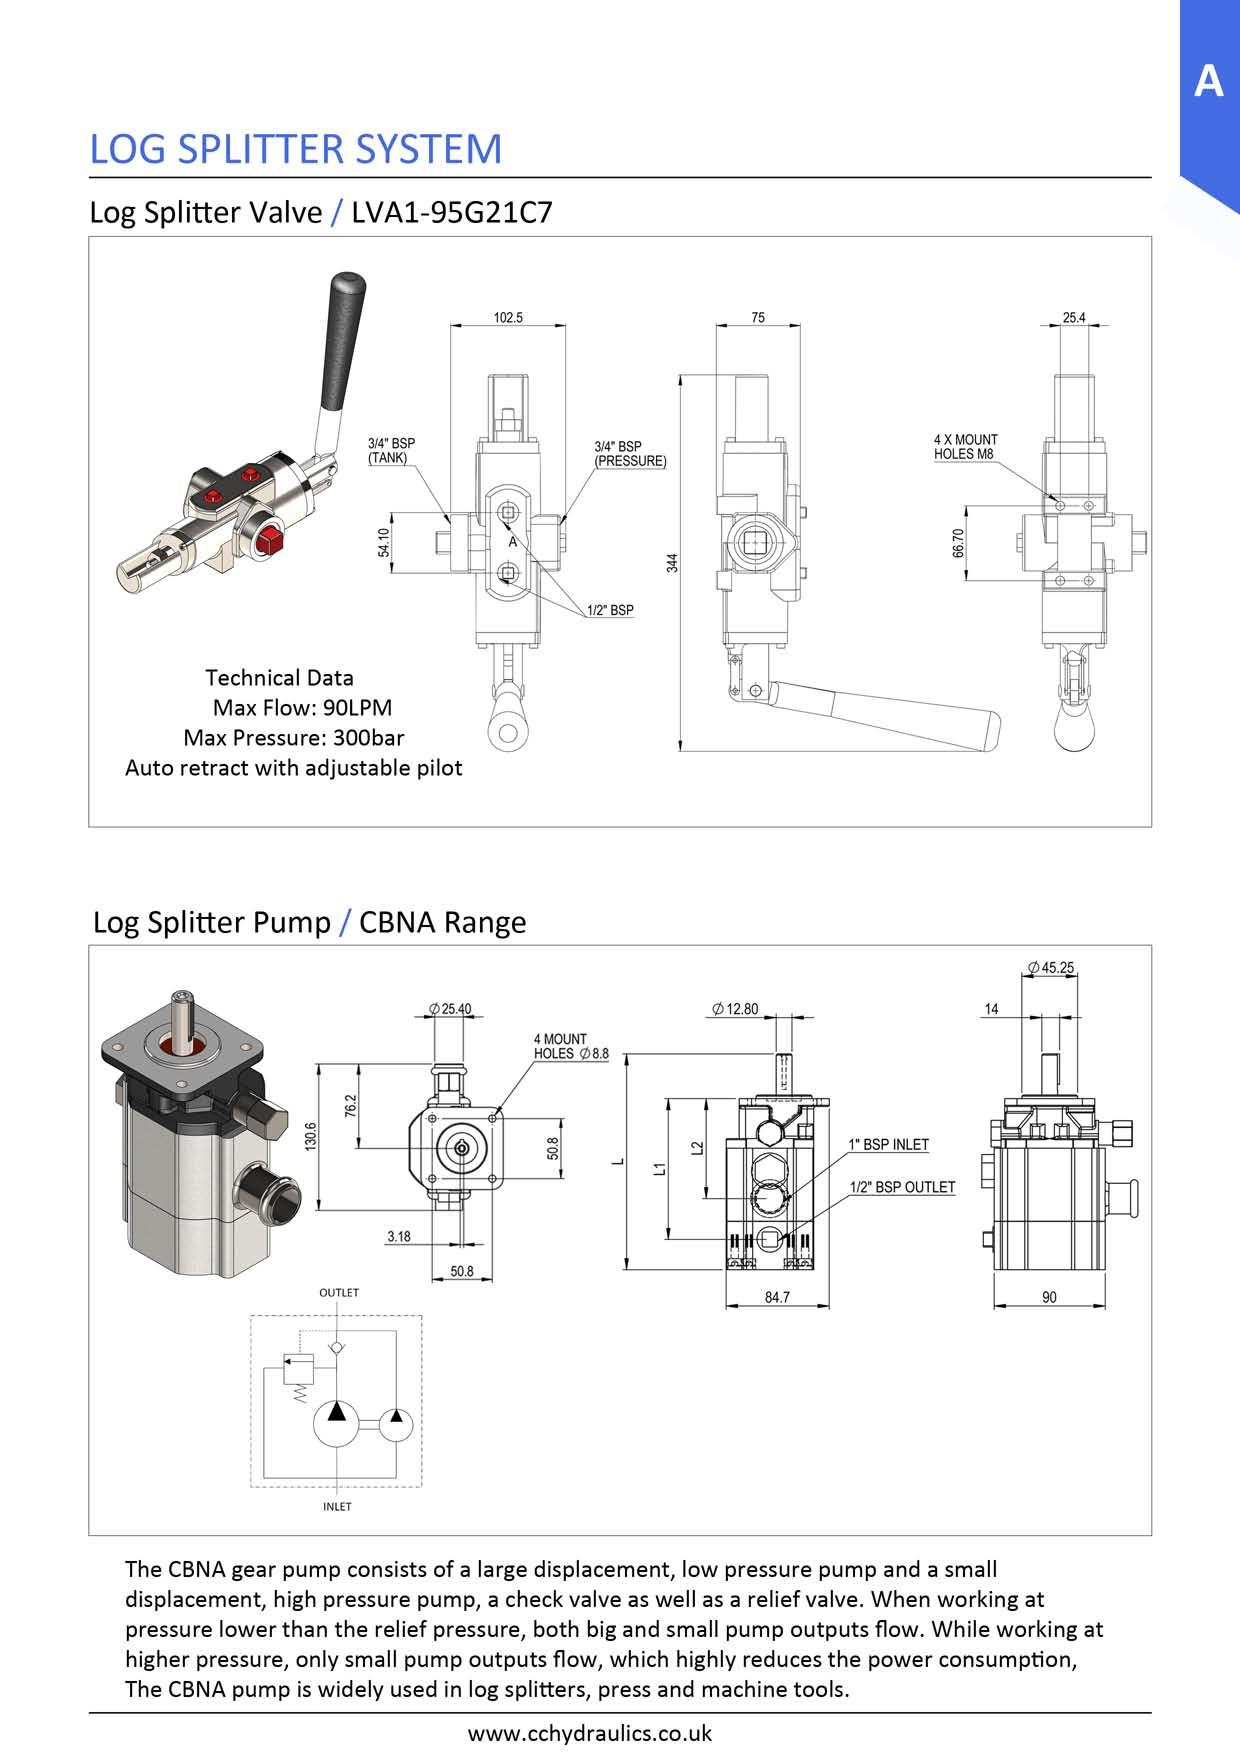 Log Splitter Hydraulic Control Valve Diagram | Standard Cylinders Double Acting Log Splitter Pump C C